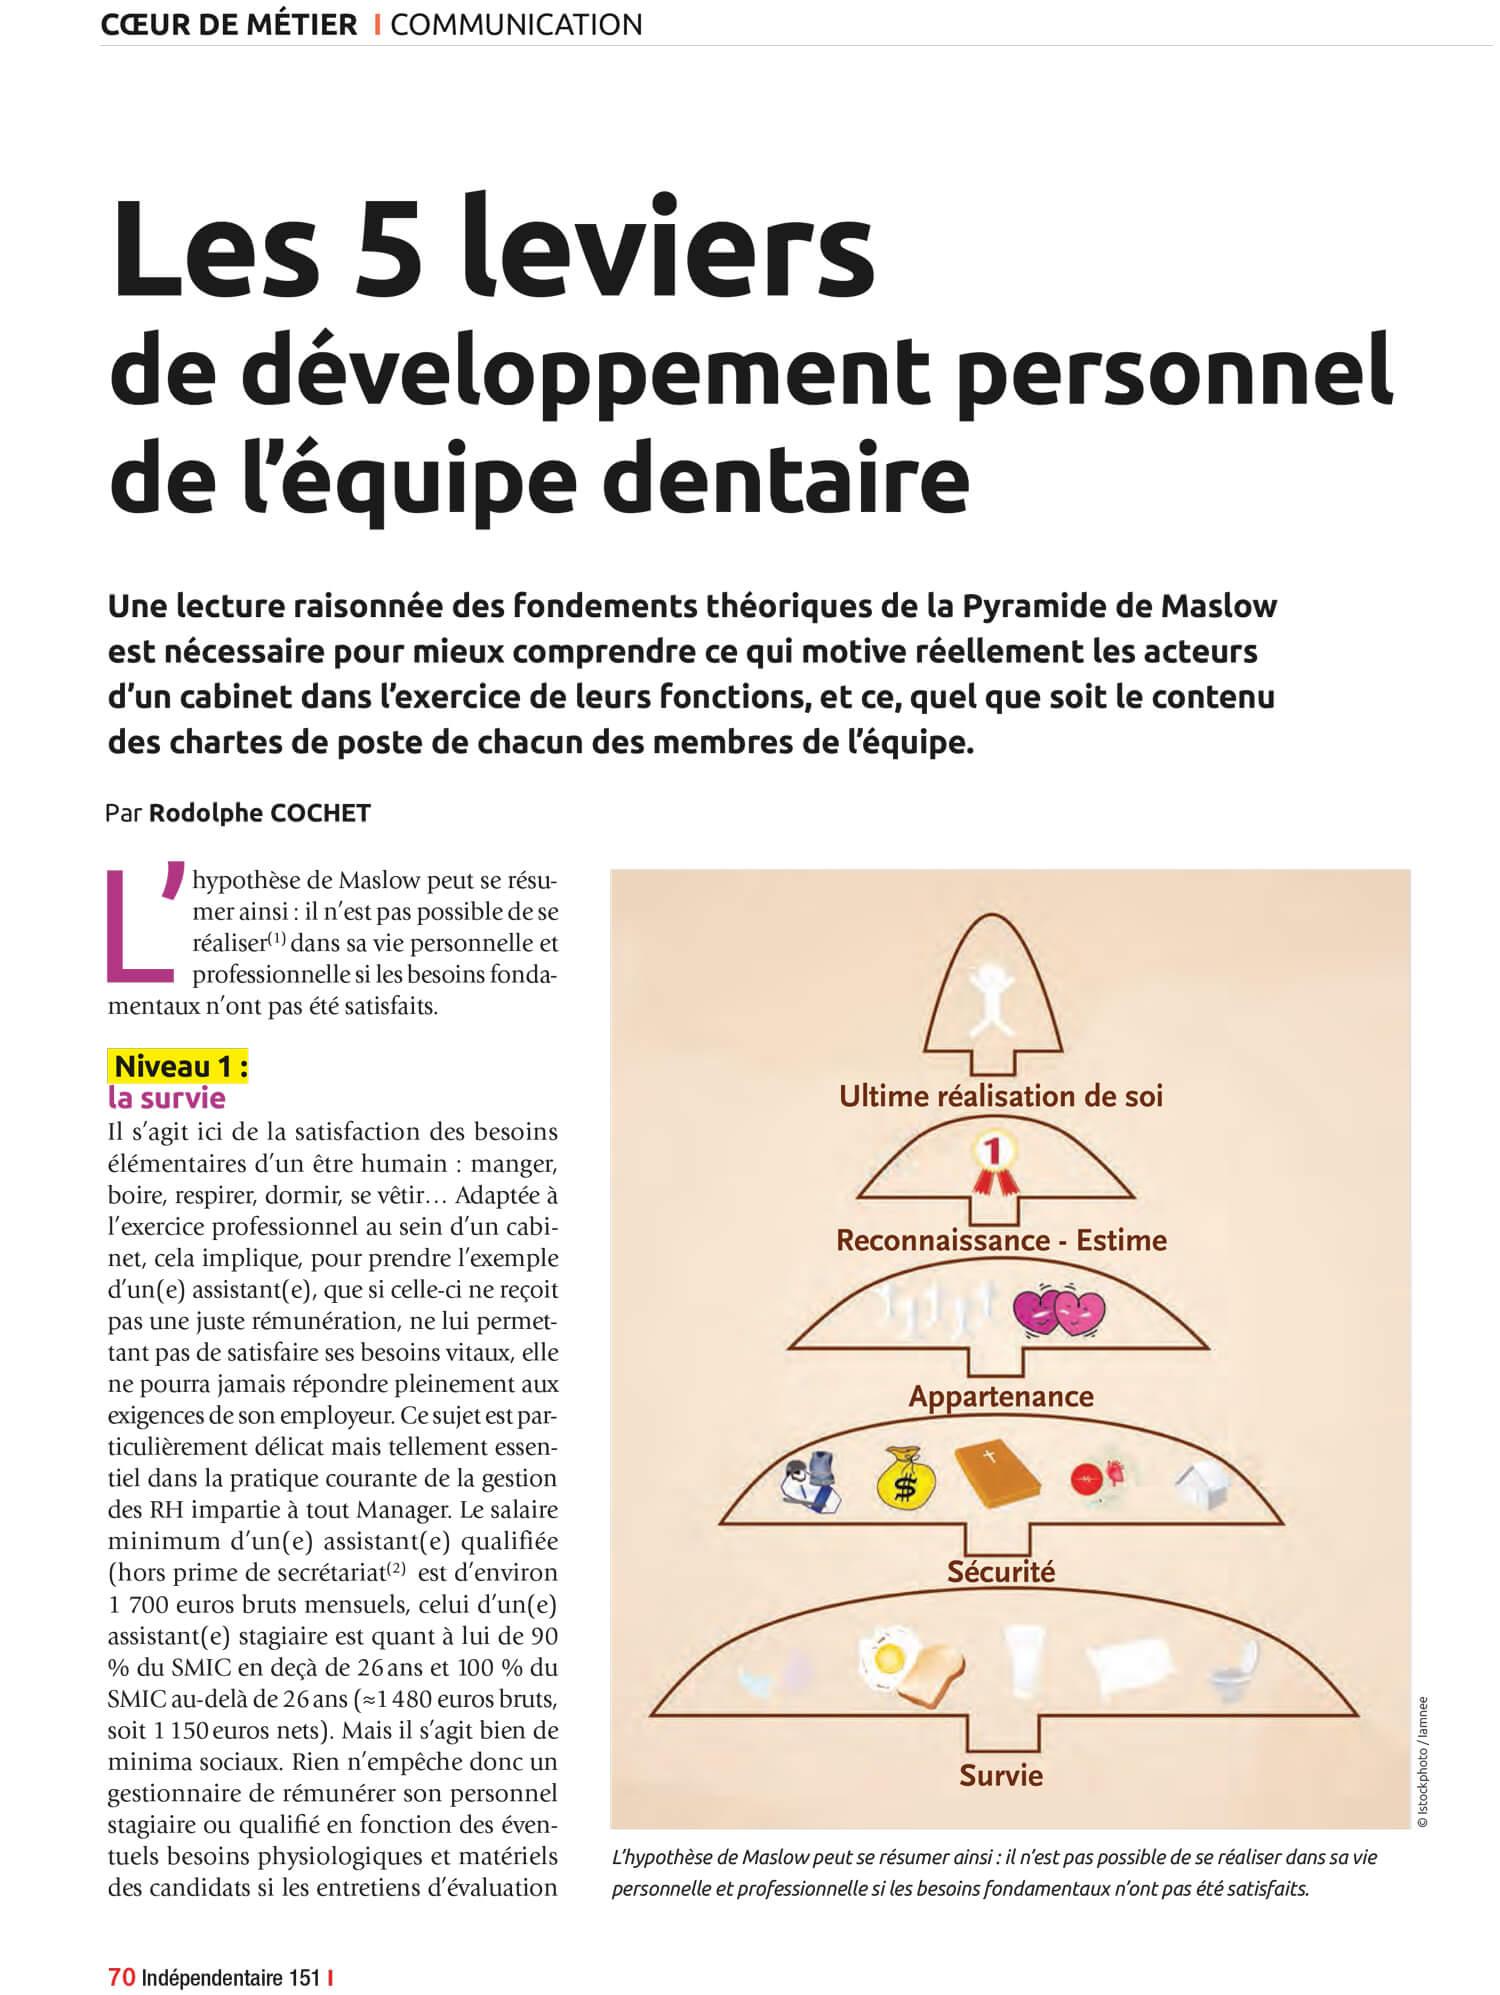 leviers-motivation-developpement-personnel-dentiste-rodolphe-cochet-rh-dentaire.jpg